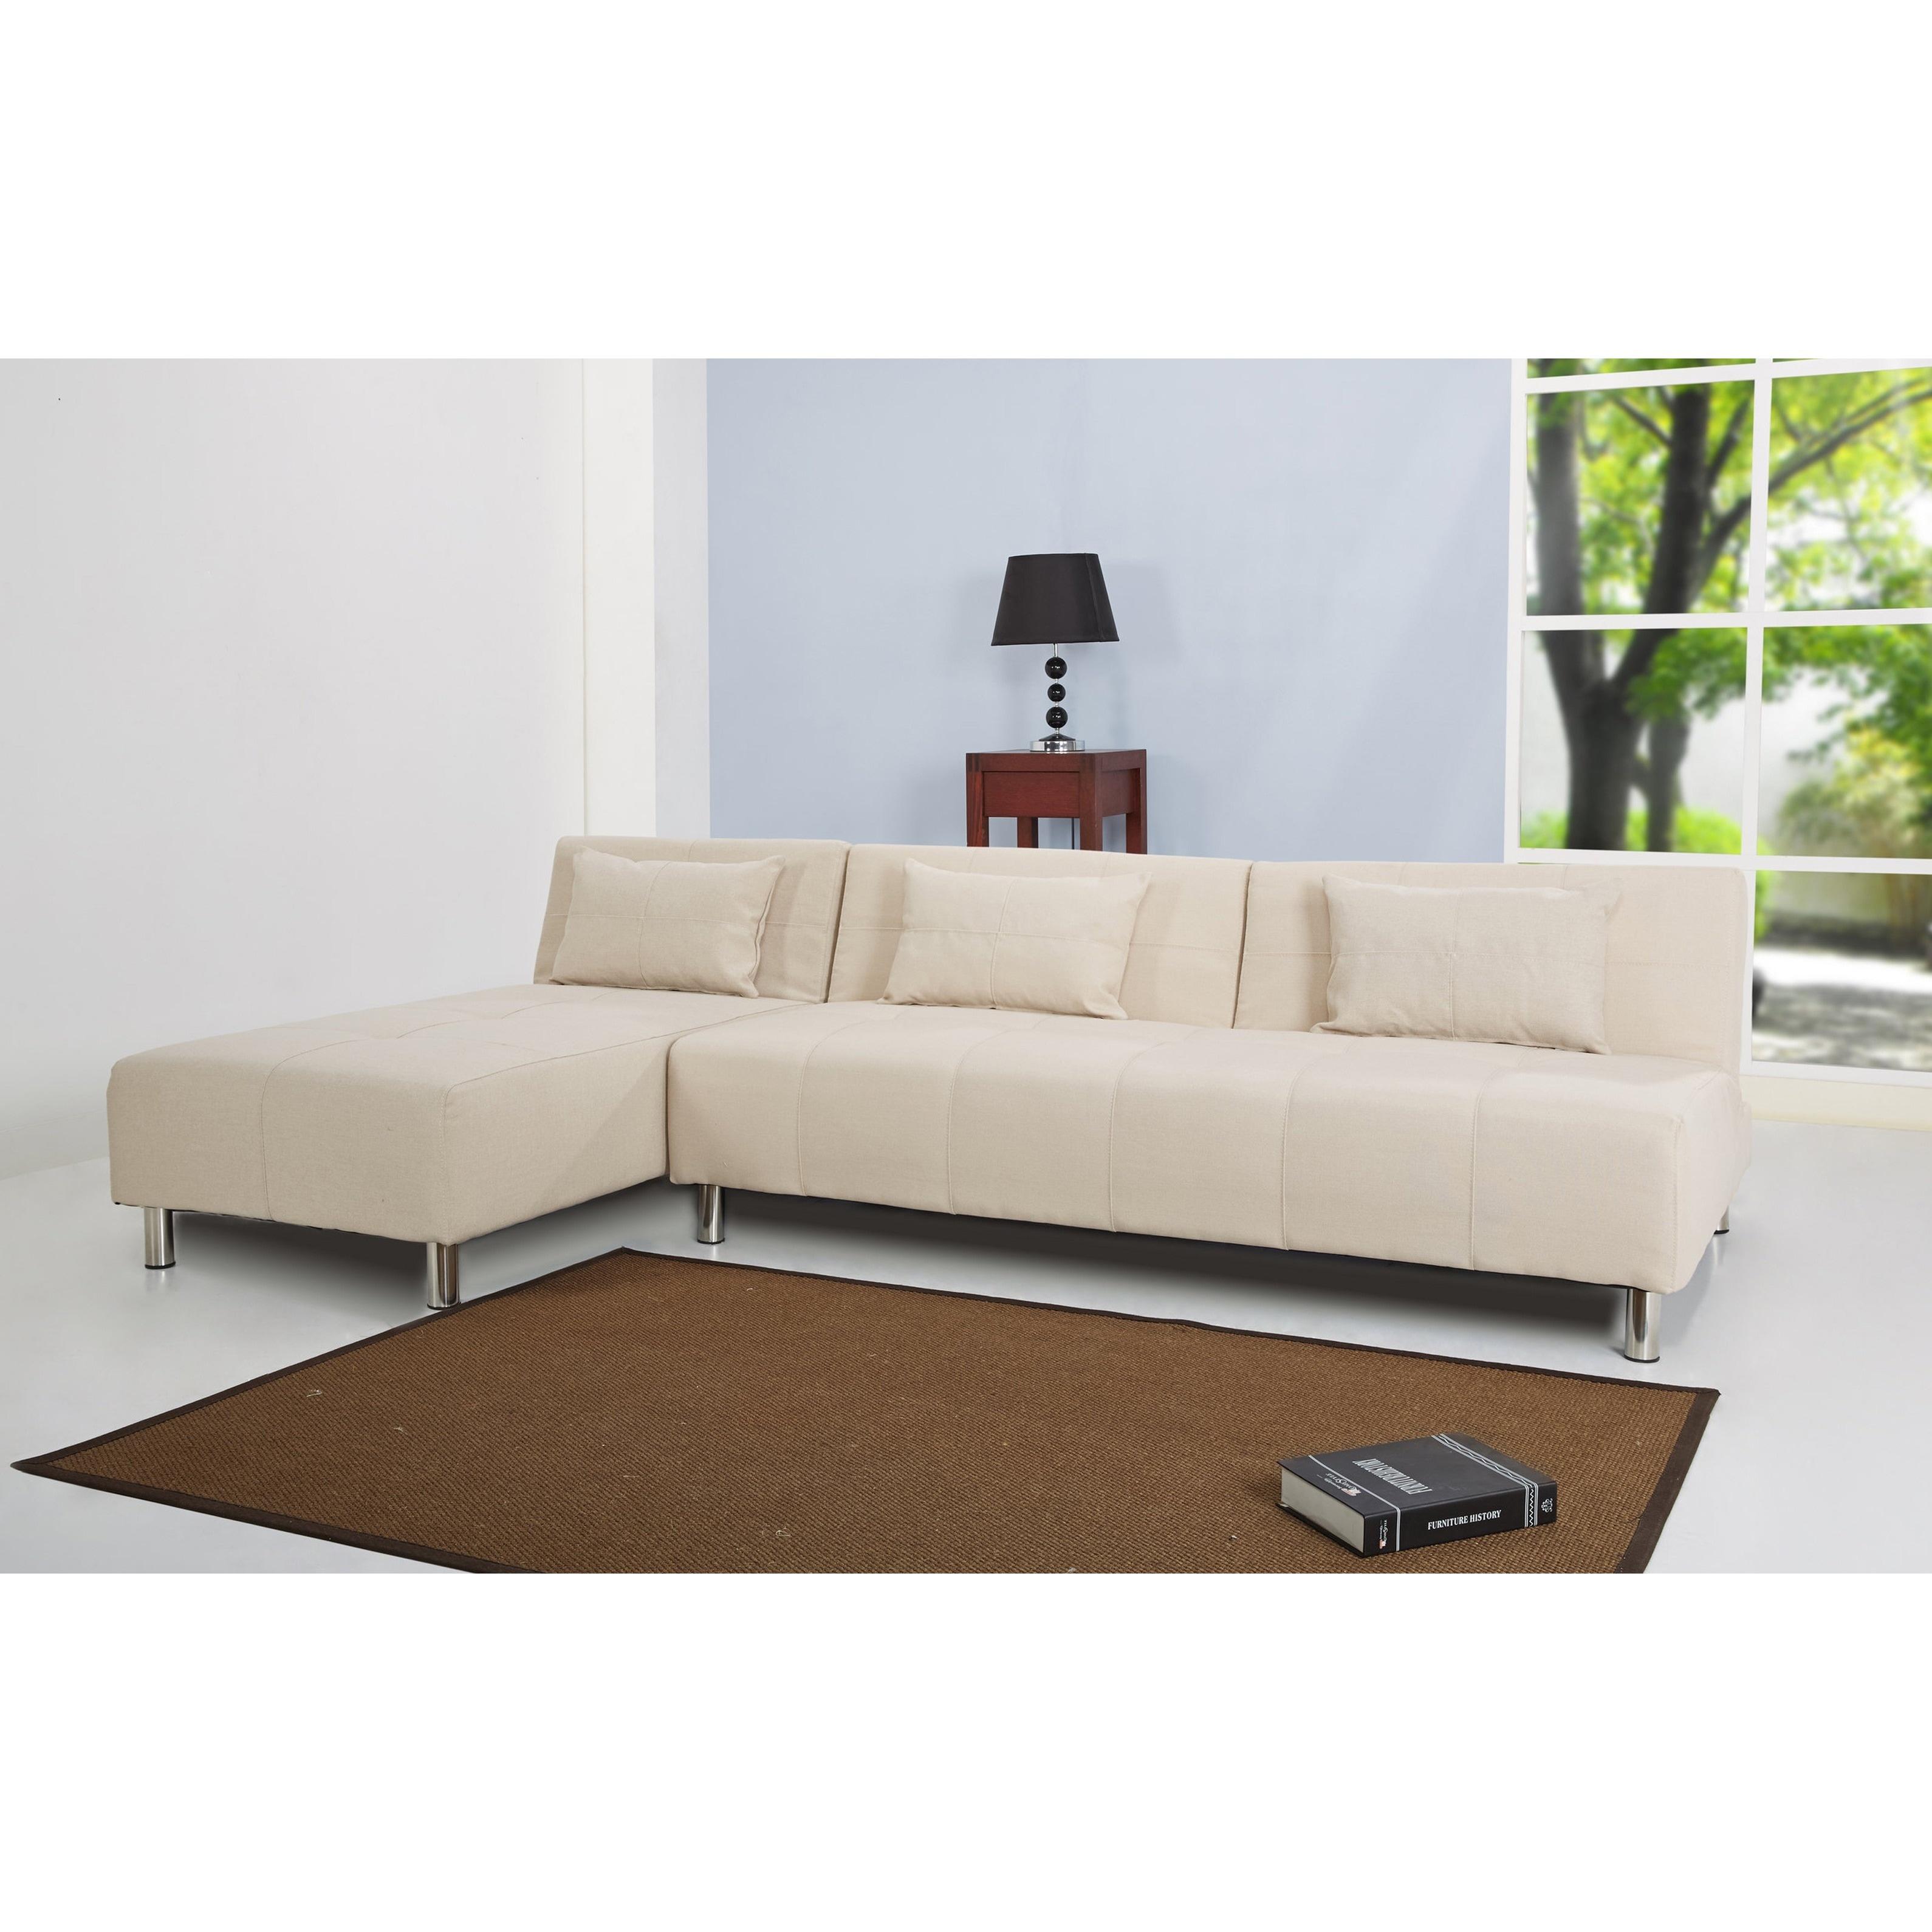 28 [ Atlanta Sofa Bed ]